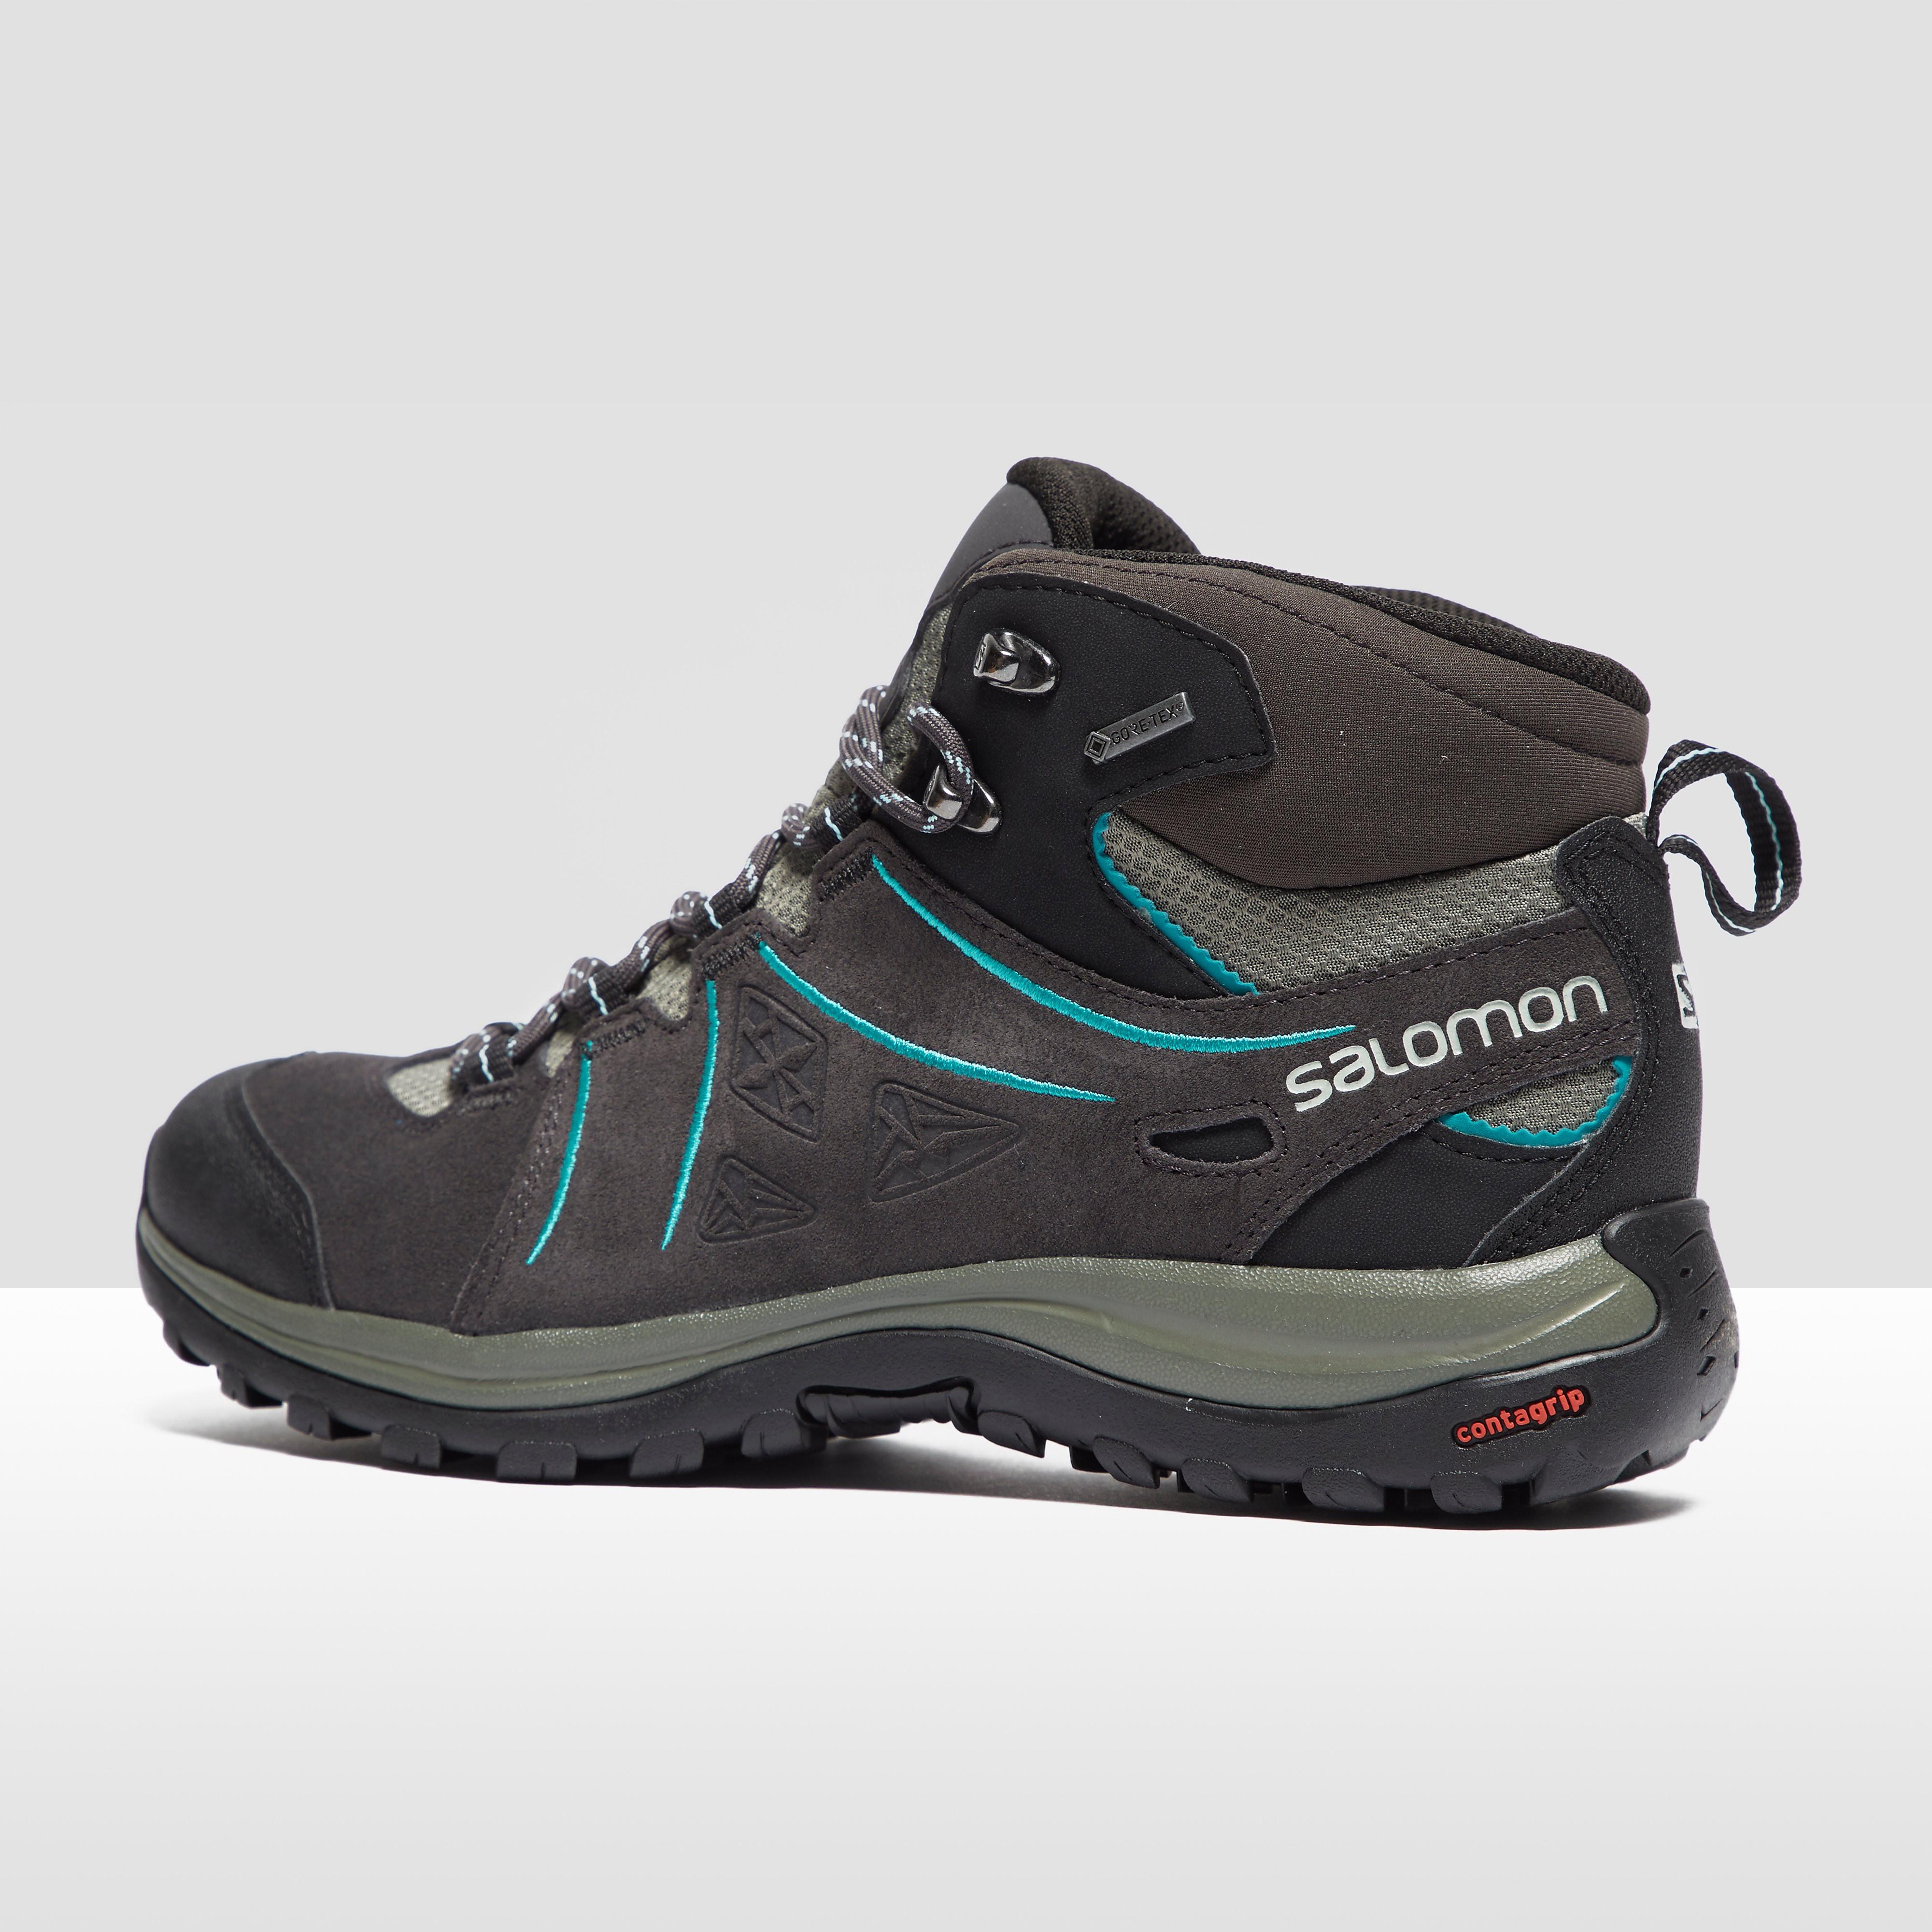 Salomon ELLIPSE 2 MID LTR GTX Women's Hiking Boots